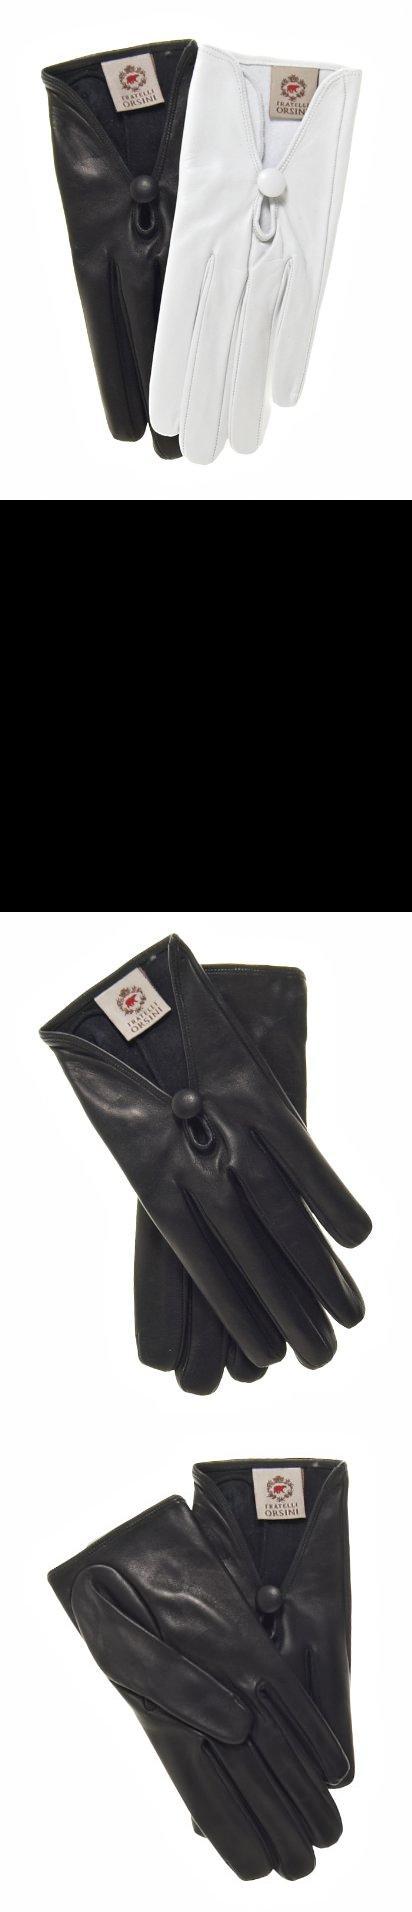 3pk wolverine leather work gloves extra large - Fratelli Orsini Women S Italian Silk Lined Leather Gloves Size 7 Color Black Leather Gloves Online Style